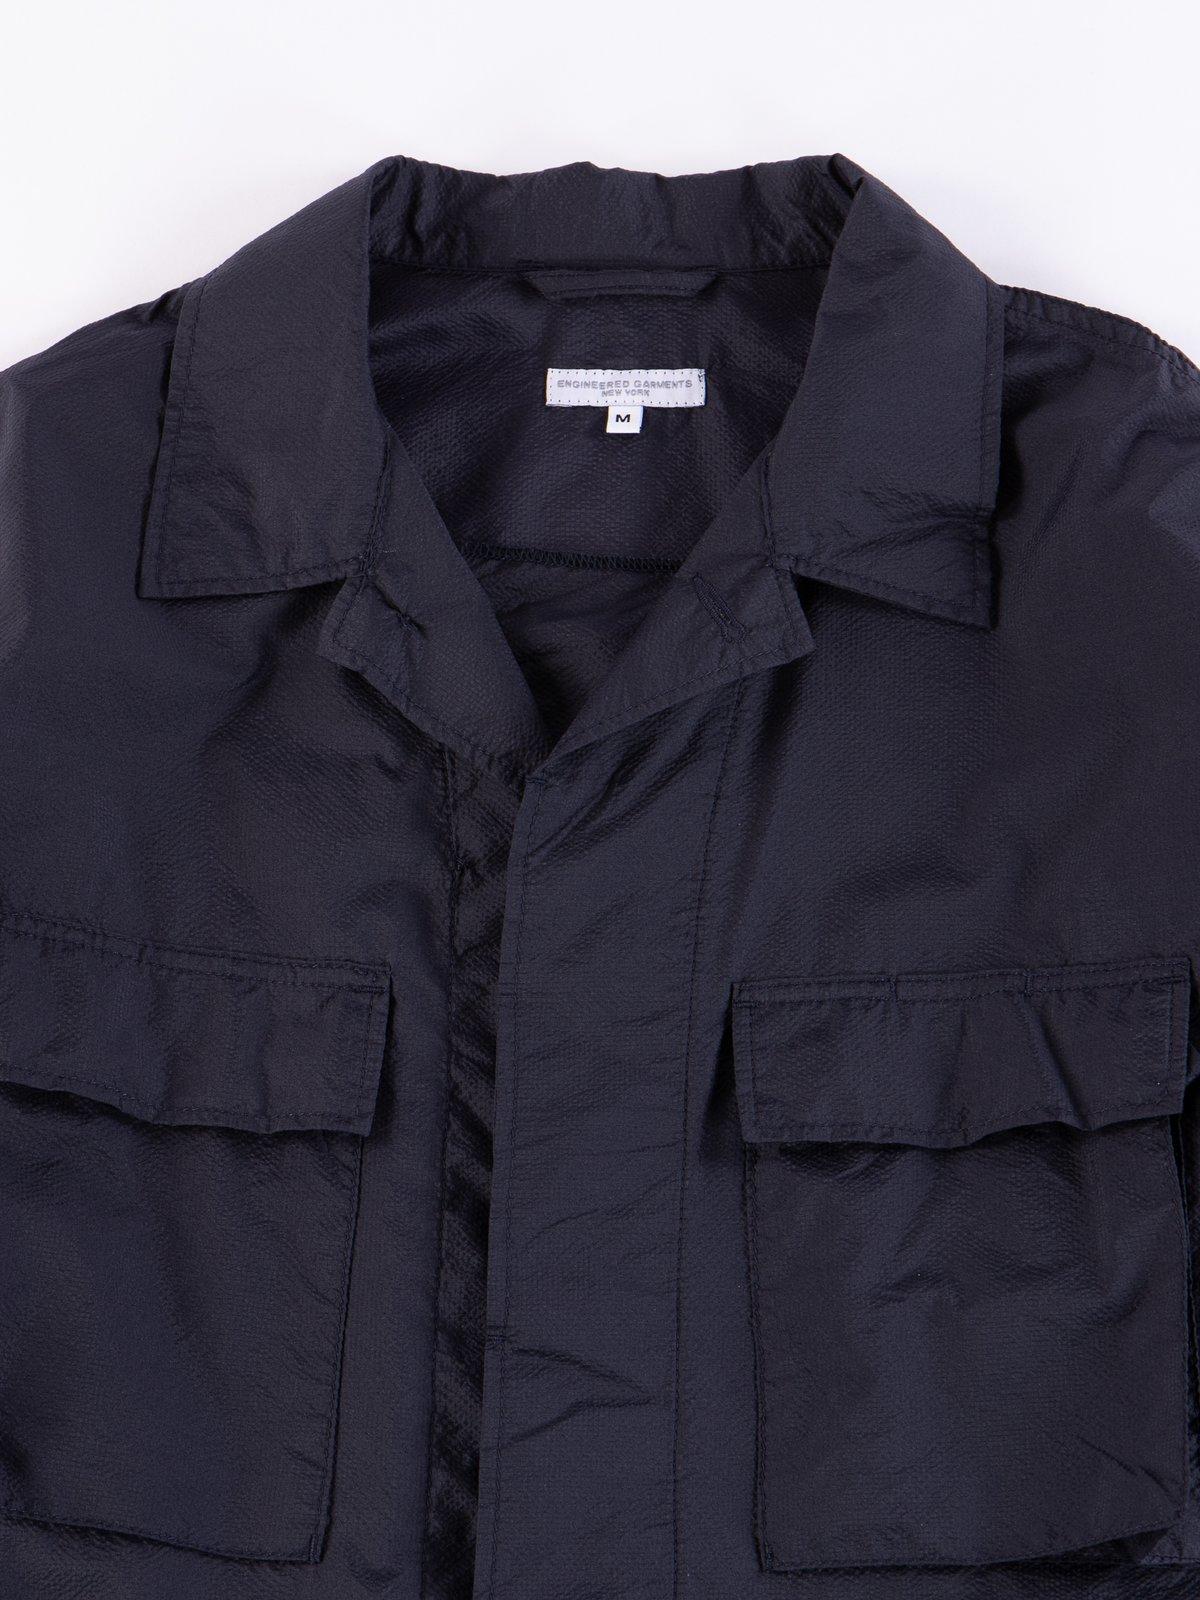 Dark Navy Nylon Micro Ripstop BDU Jacket - Image 3